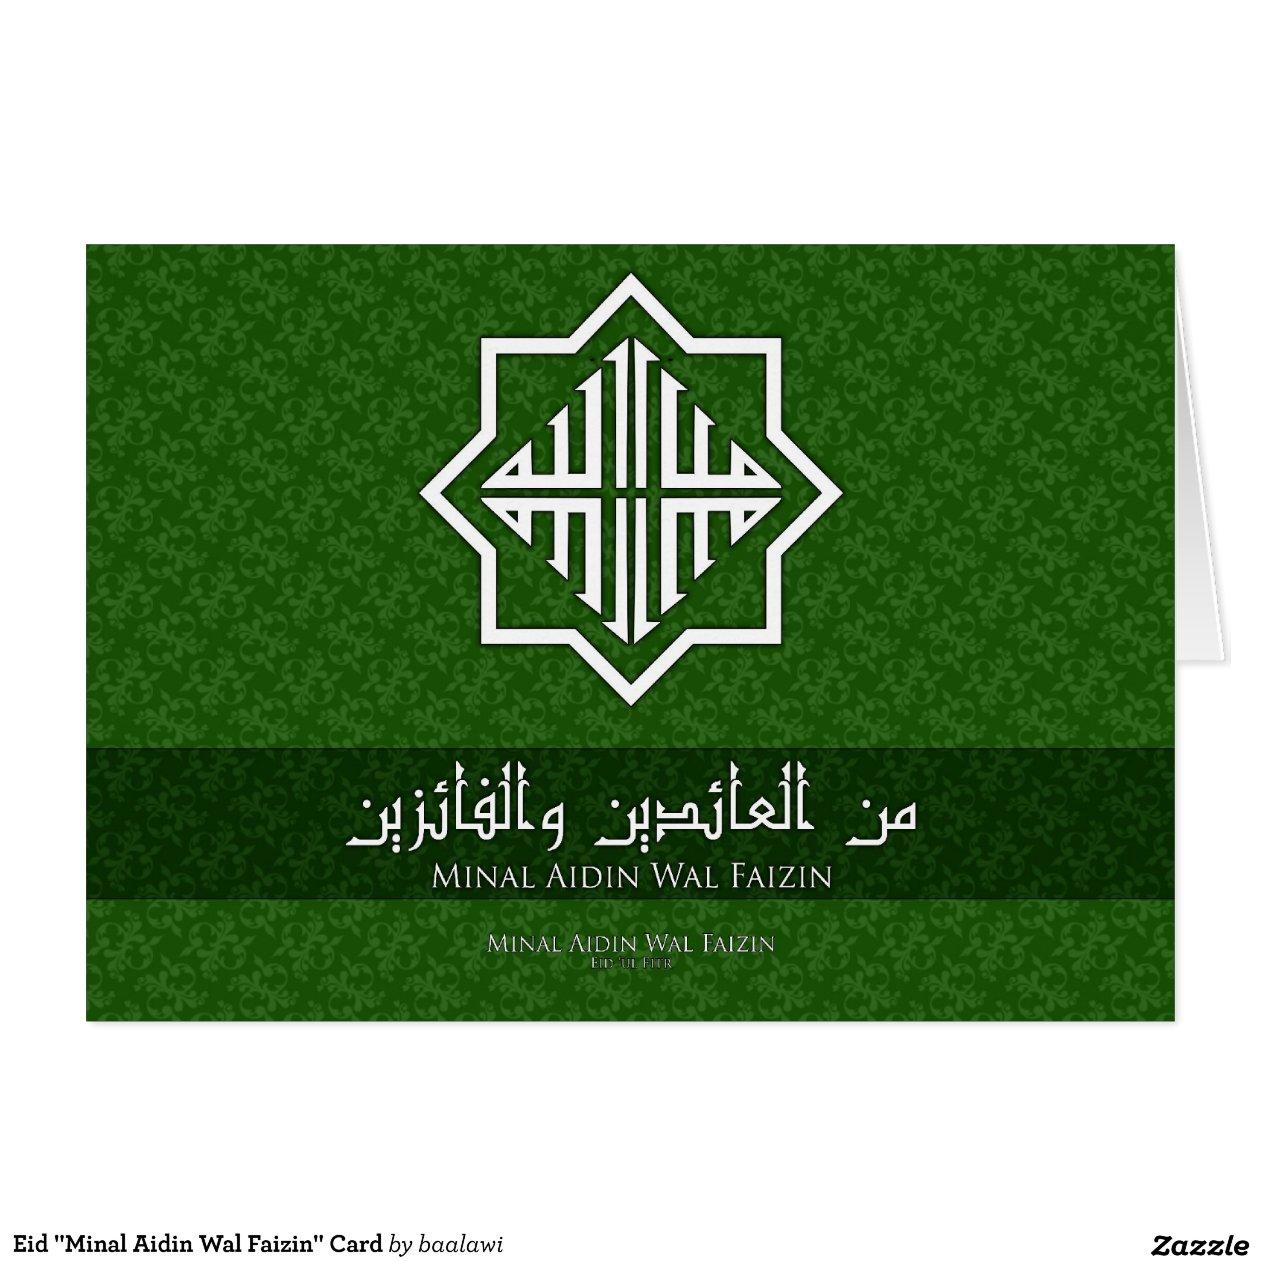 Eid Minal Aidin Wal Faizin Card